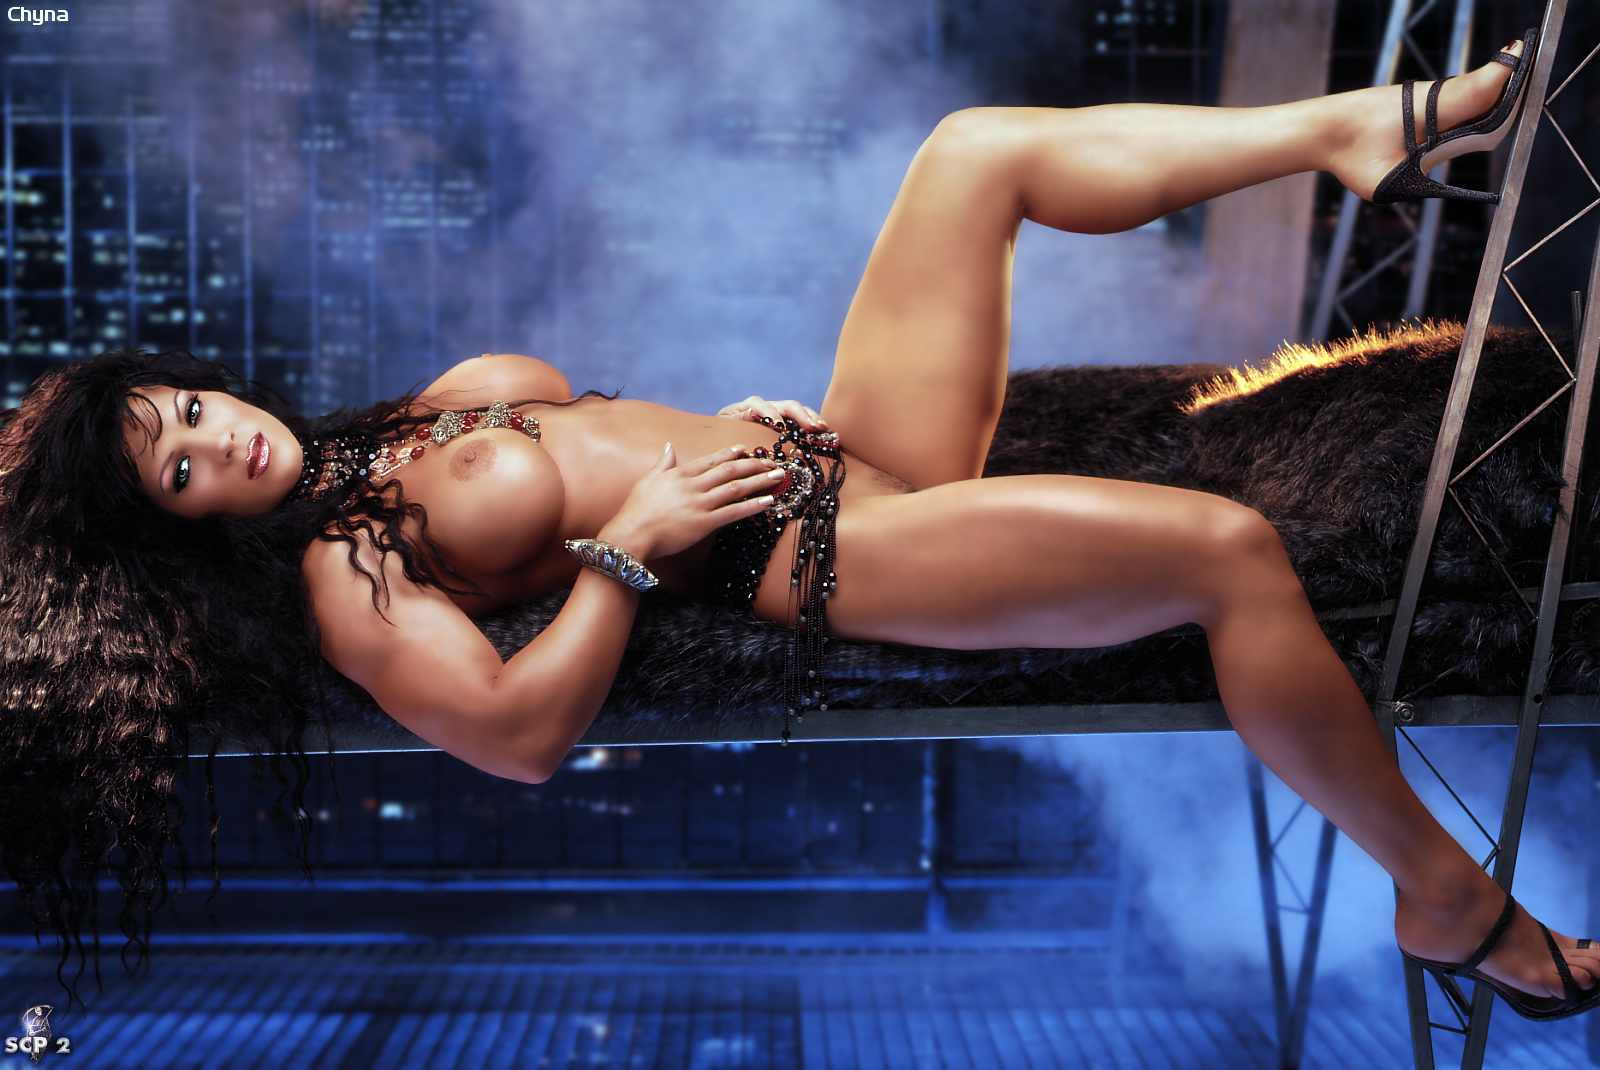 Eva tamargo sexy